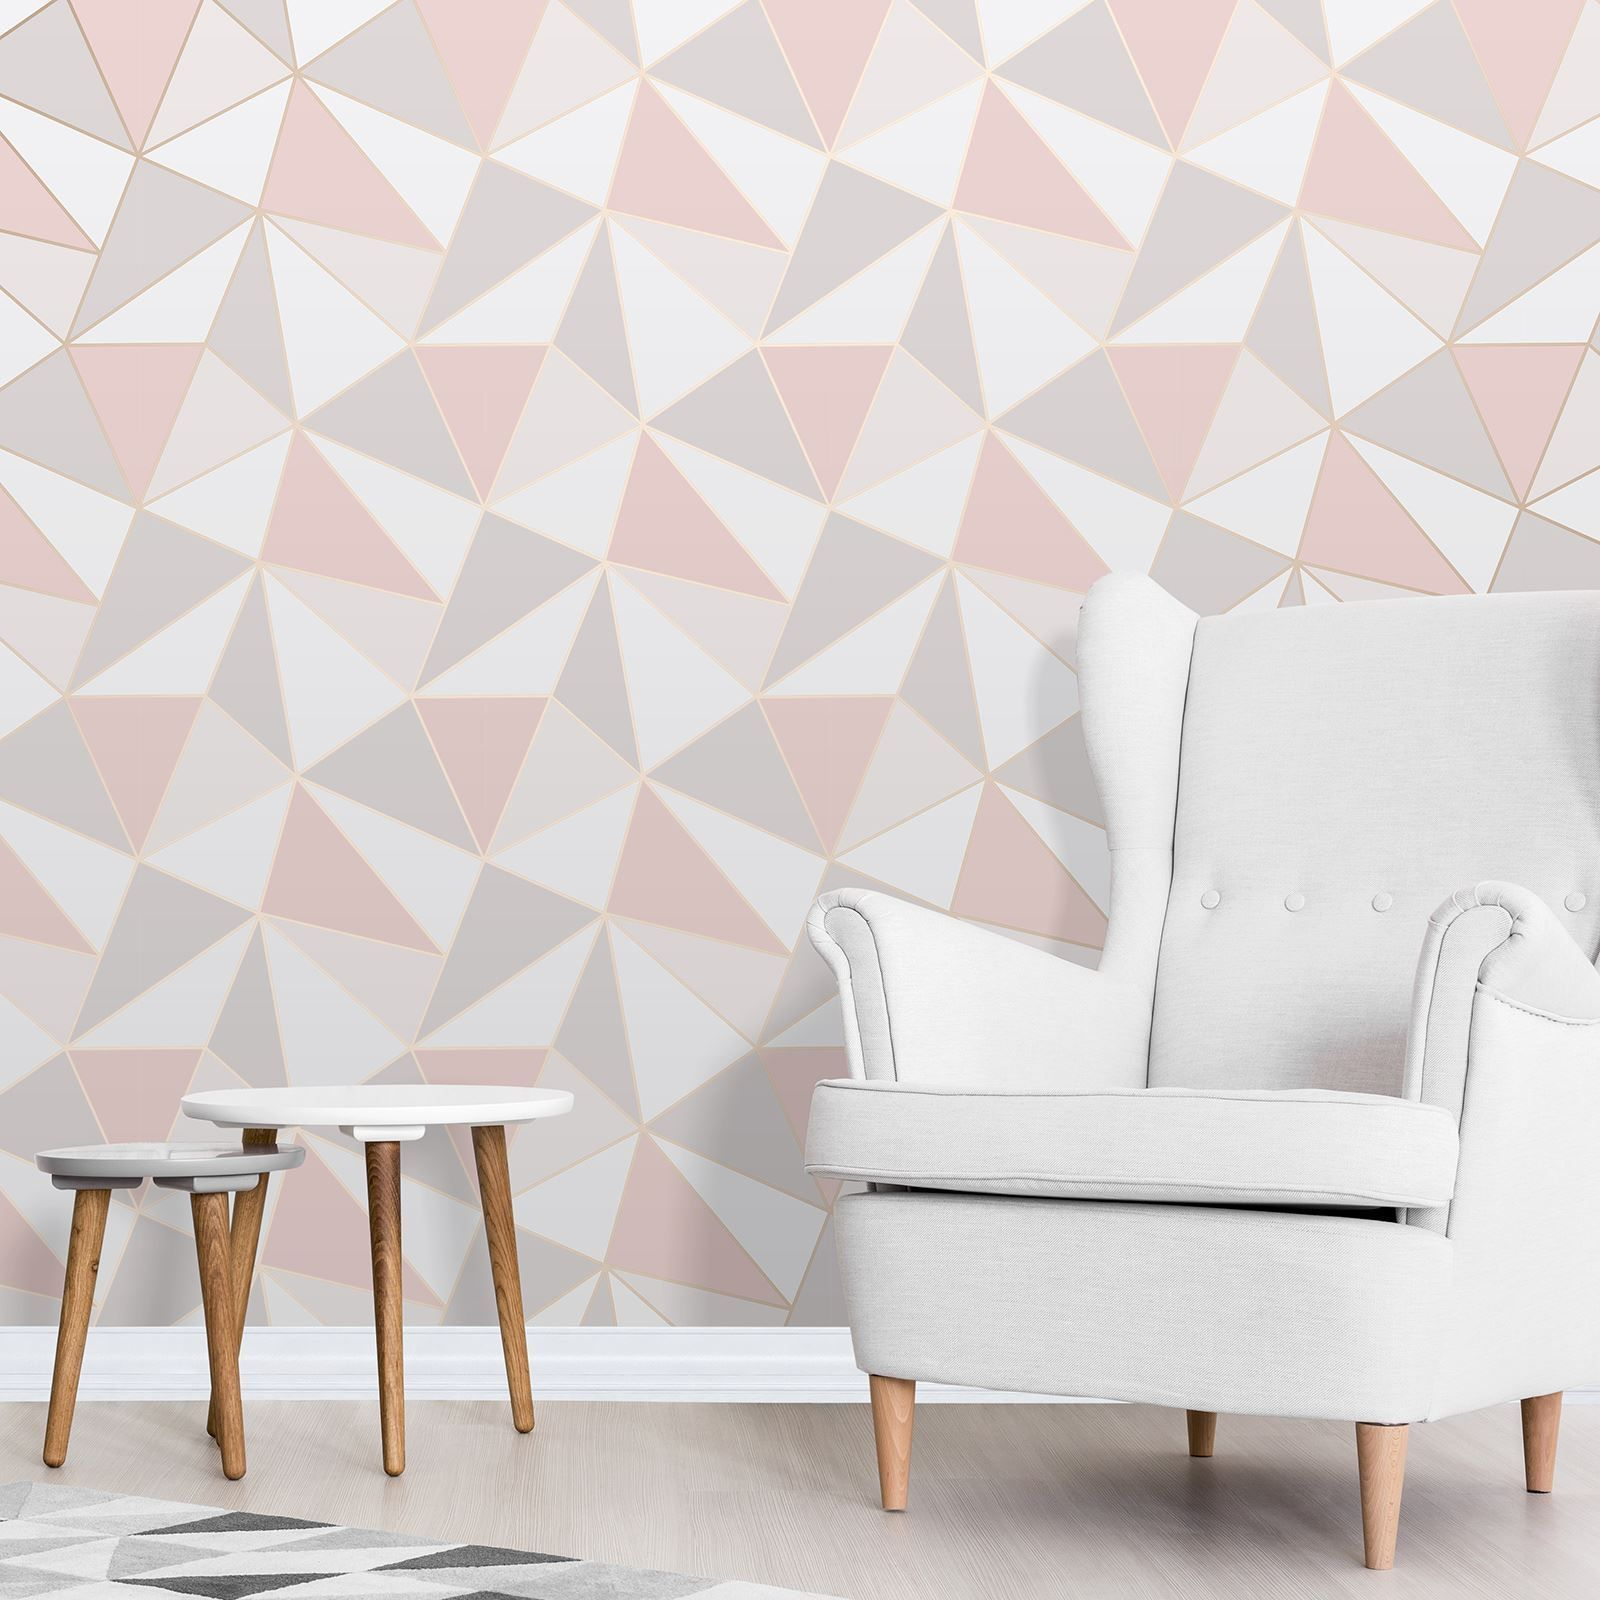 Apex Geometric Wallpaper Rose Gold / Pink Fine Decor